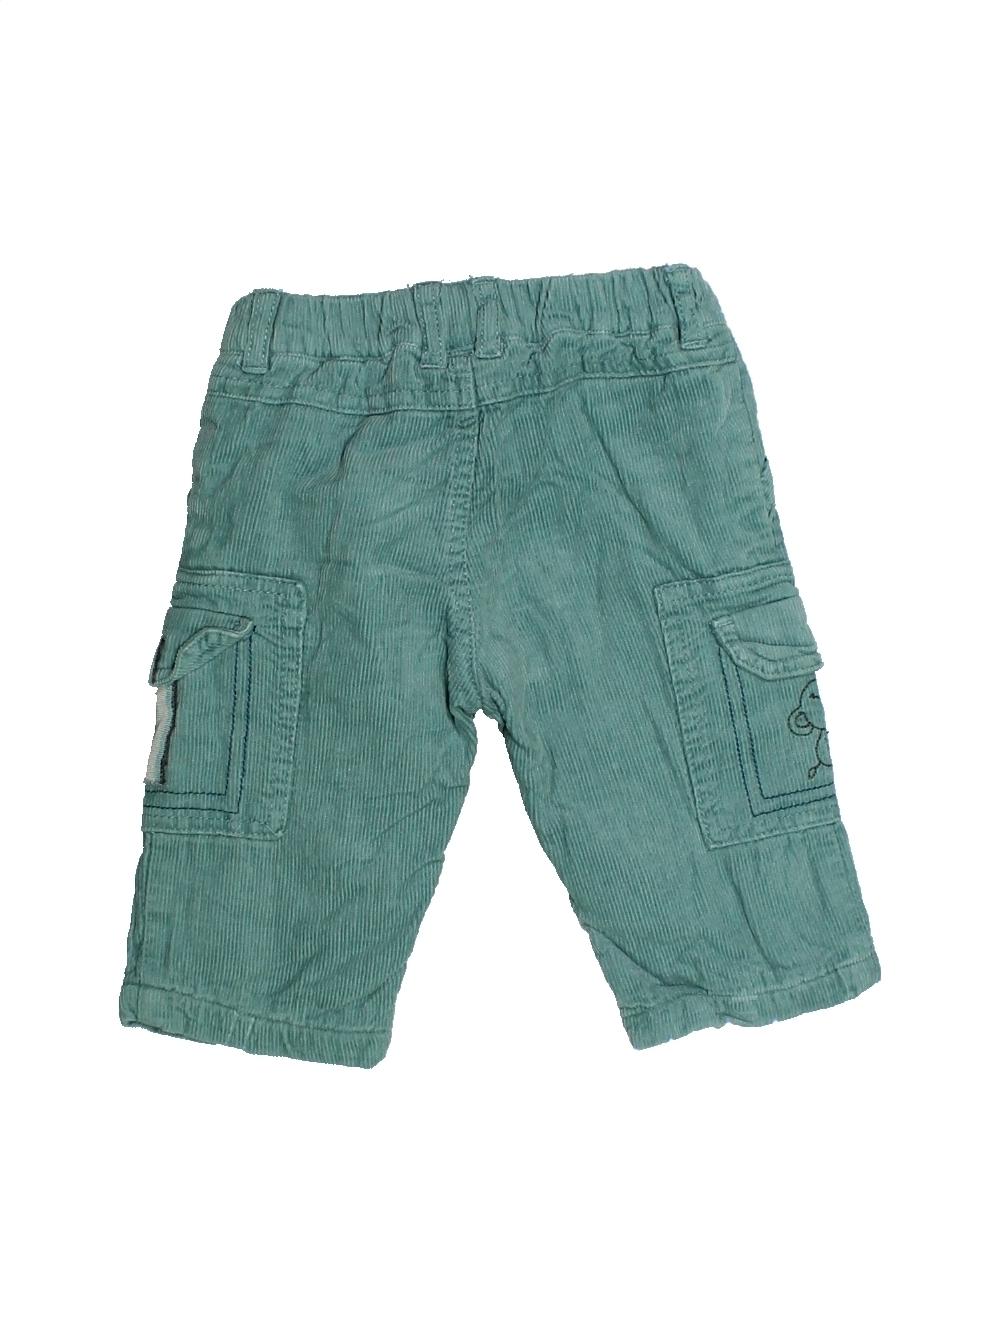 Pantalon-bebe-garcon-SERGENT-MAJOR-6-mois-bleu-hiver-vetement-bebe-1090